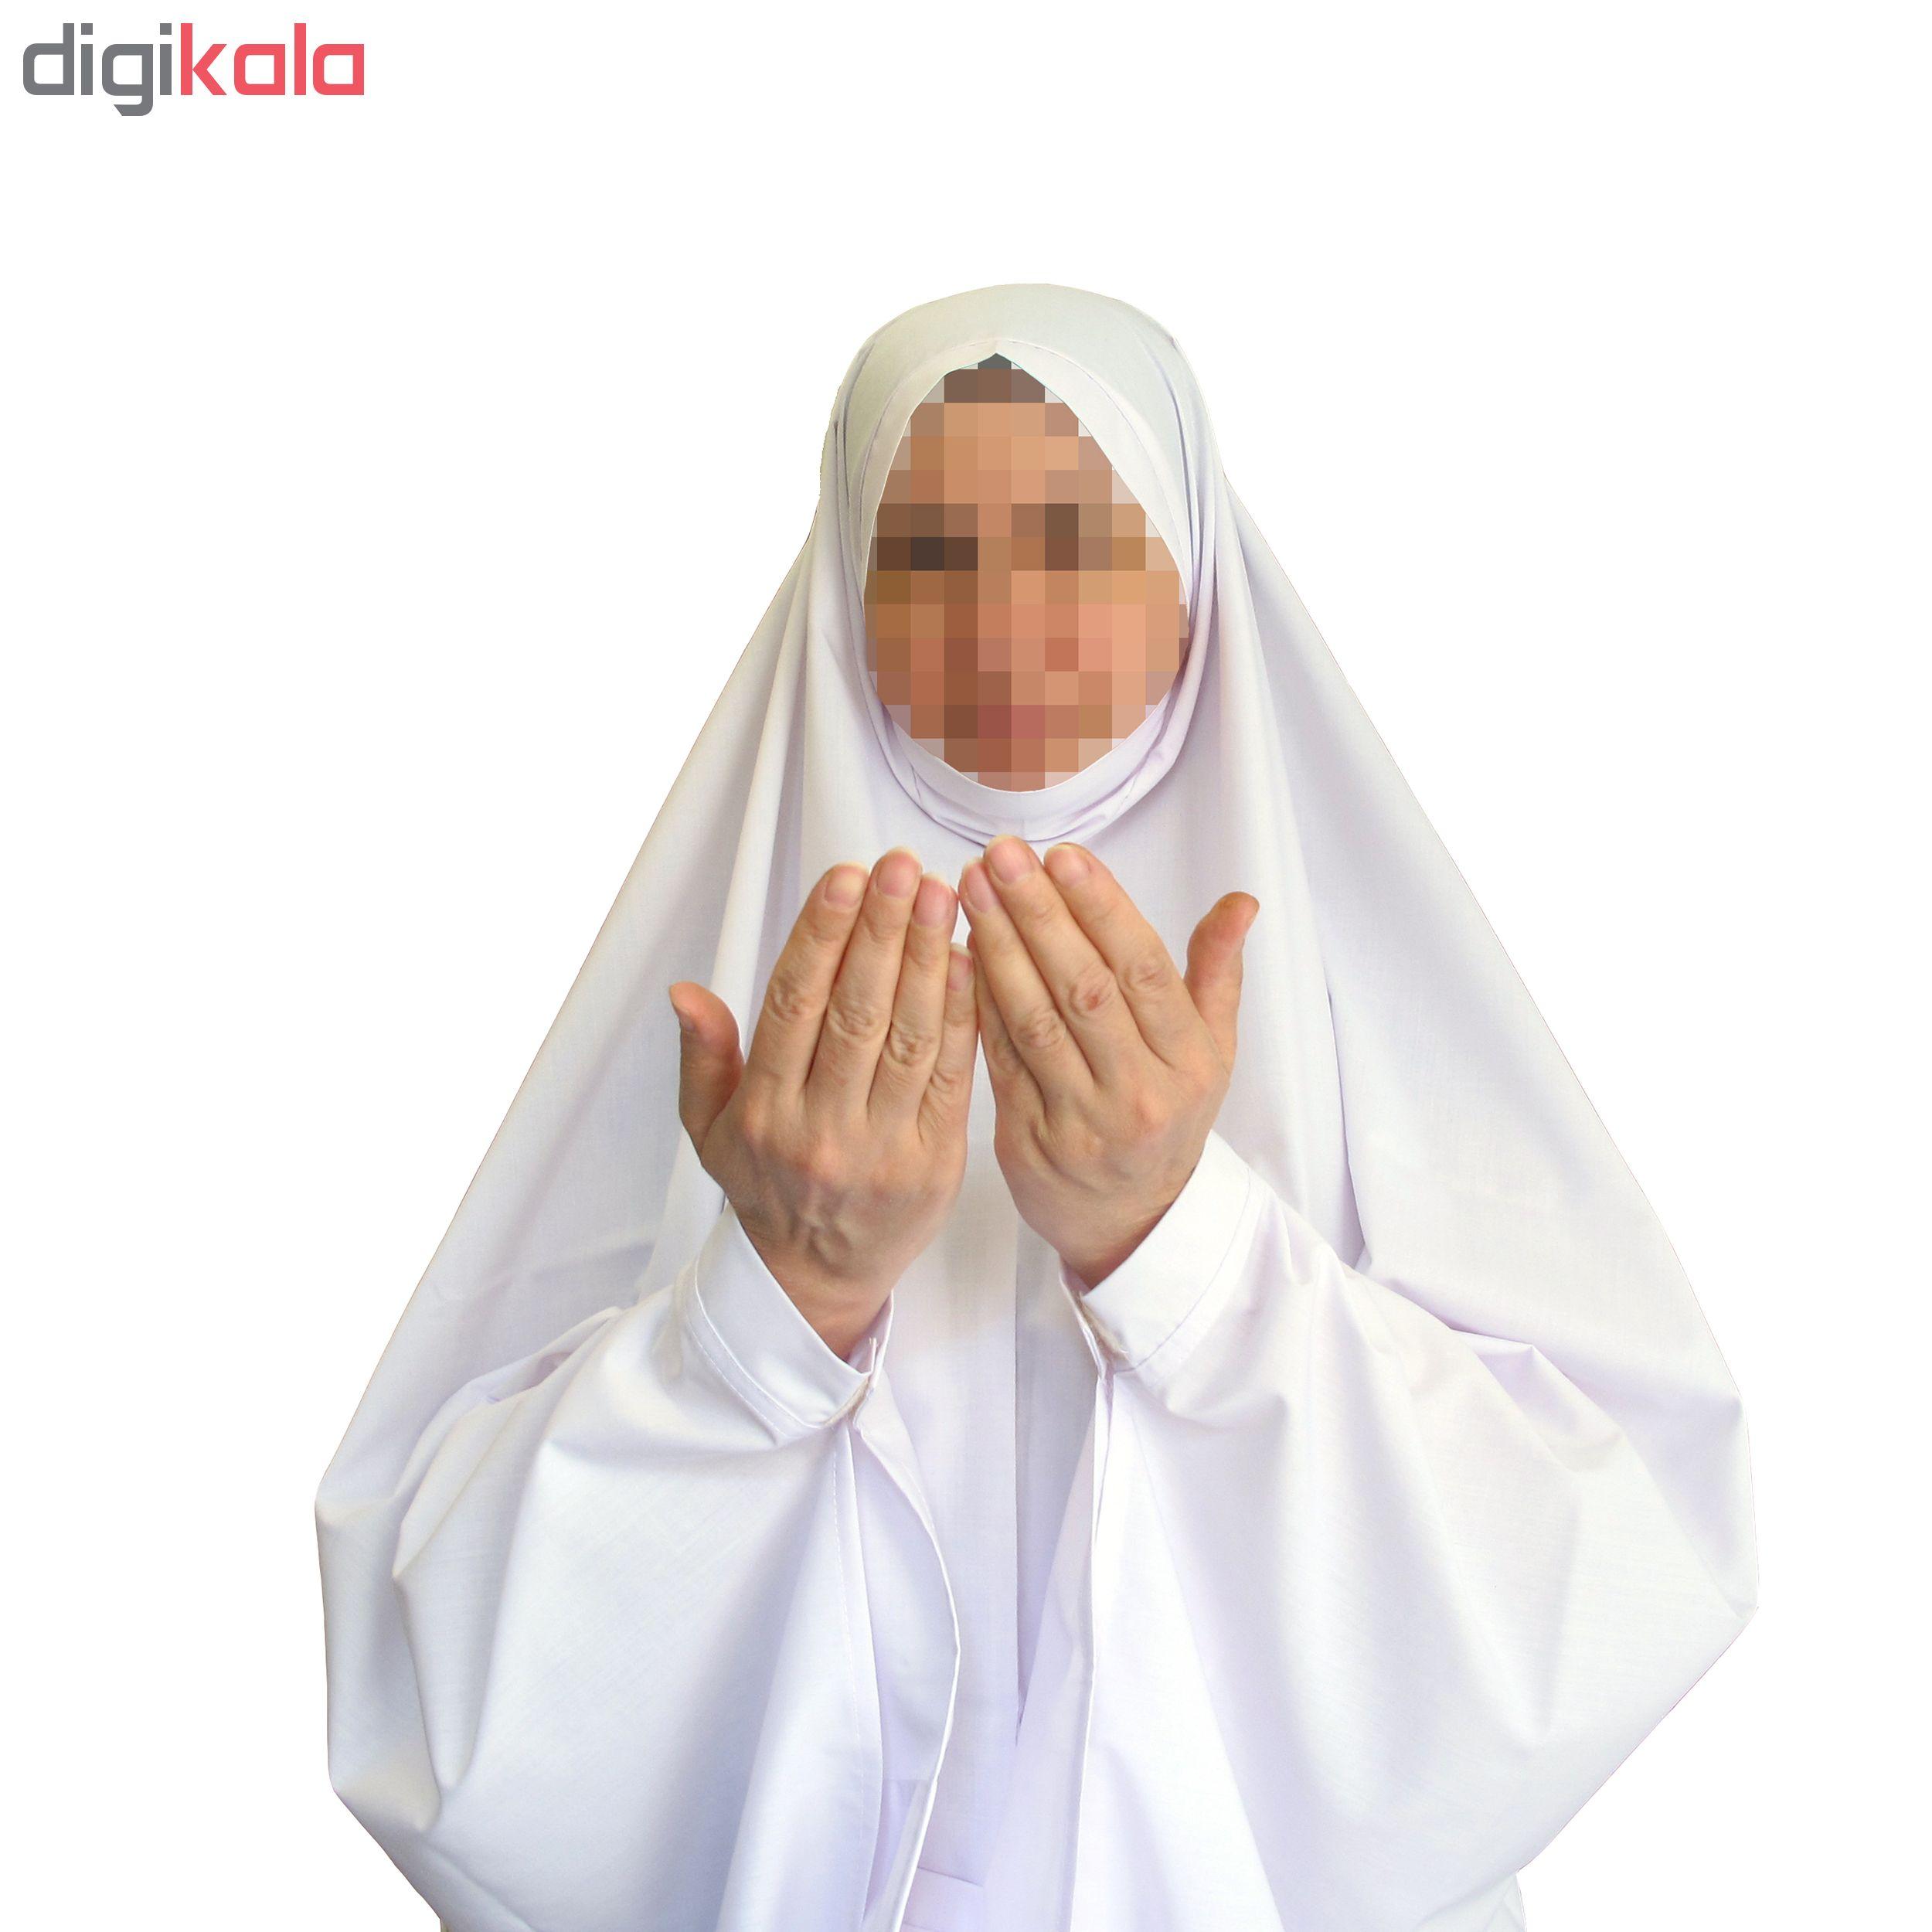 چادر نماز تترون نخی طرح احرام قد ۱۵۵ تا ۱۶۵ کد 101